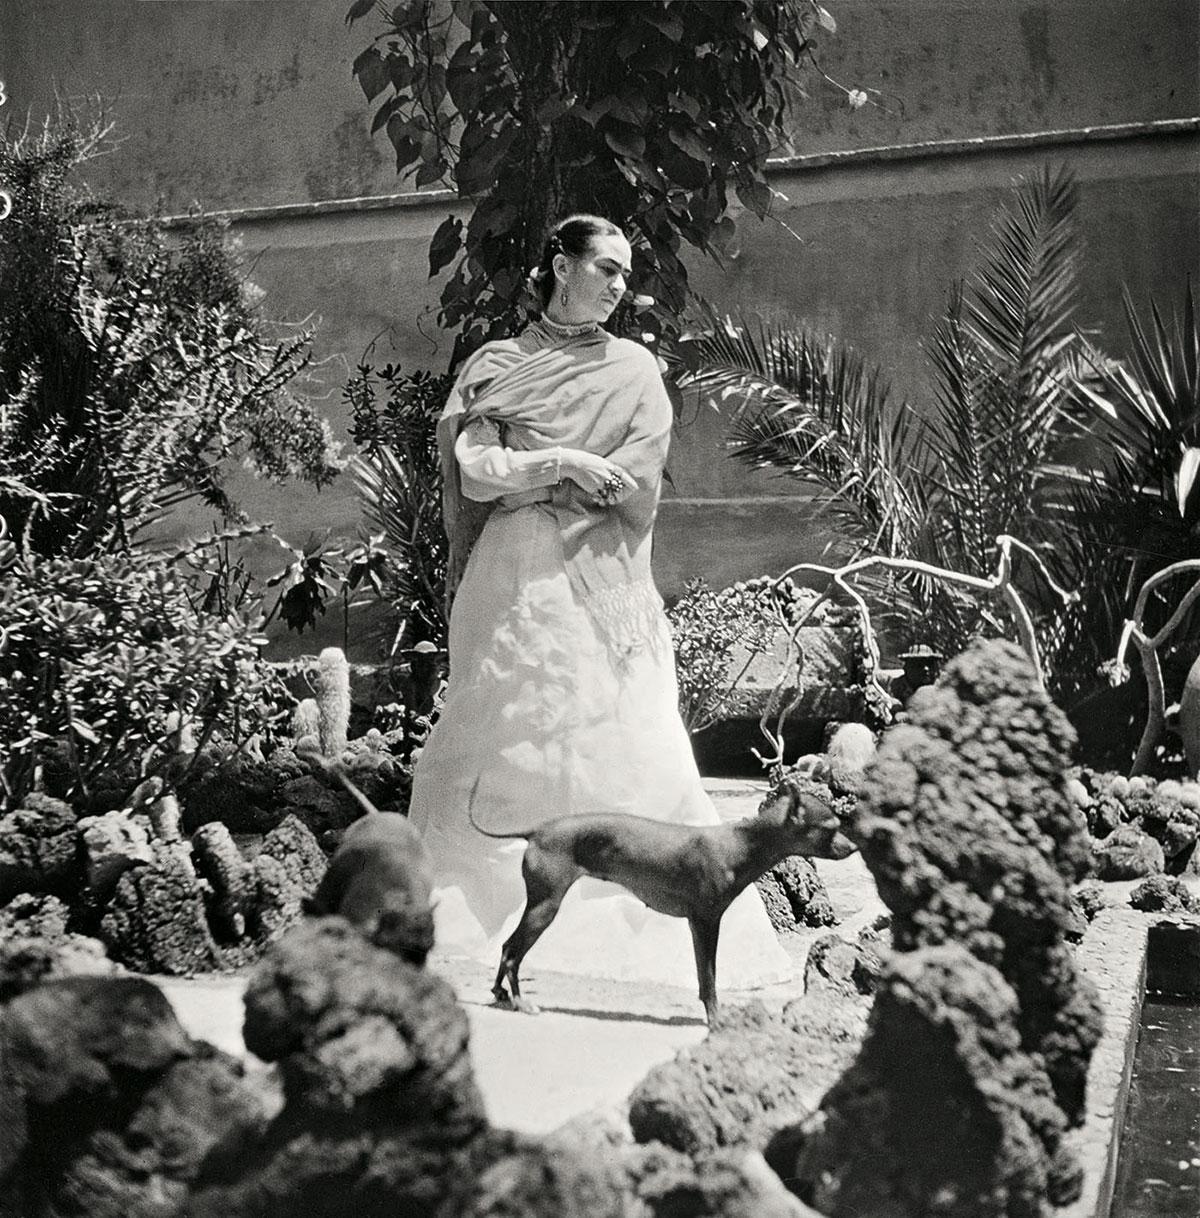 Frida Kahlo by Gisèle Freund (1950/1952)